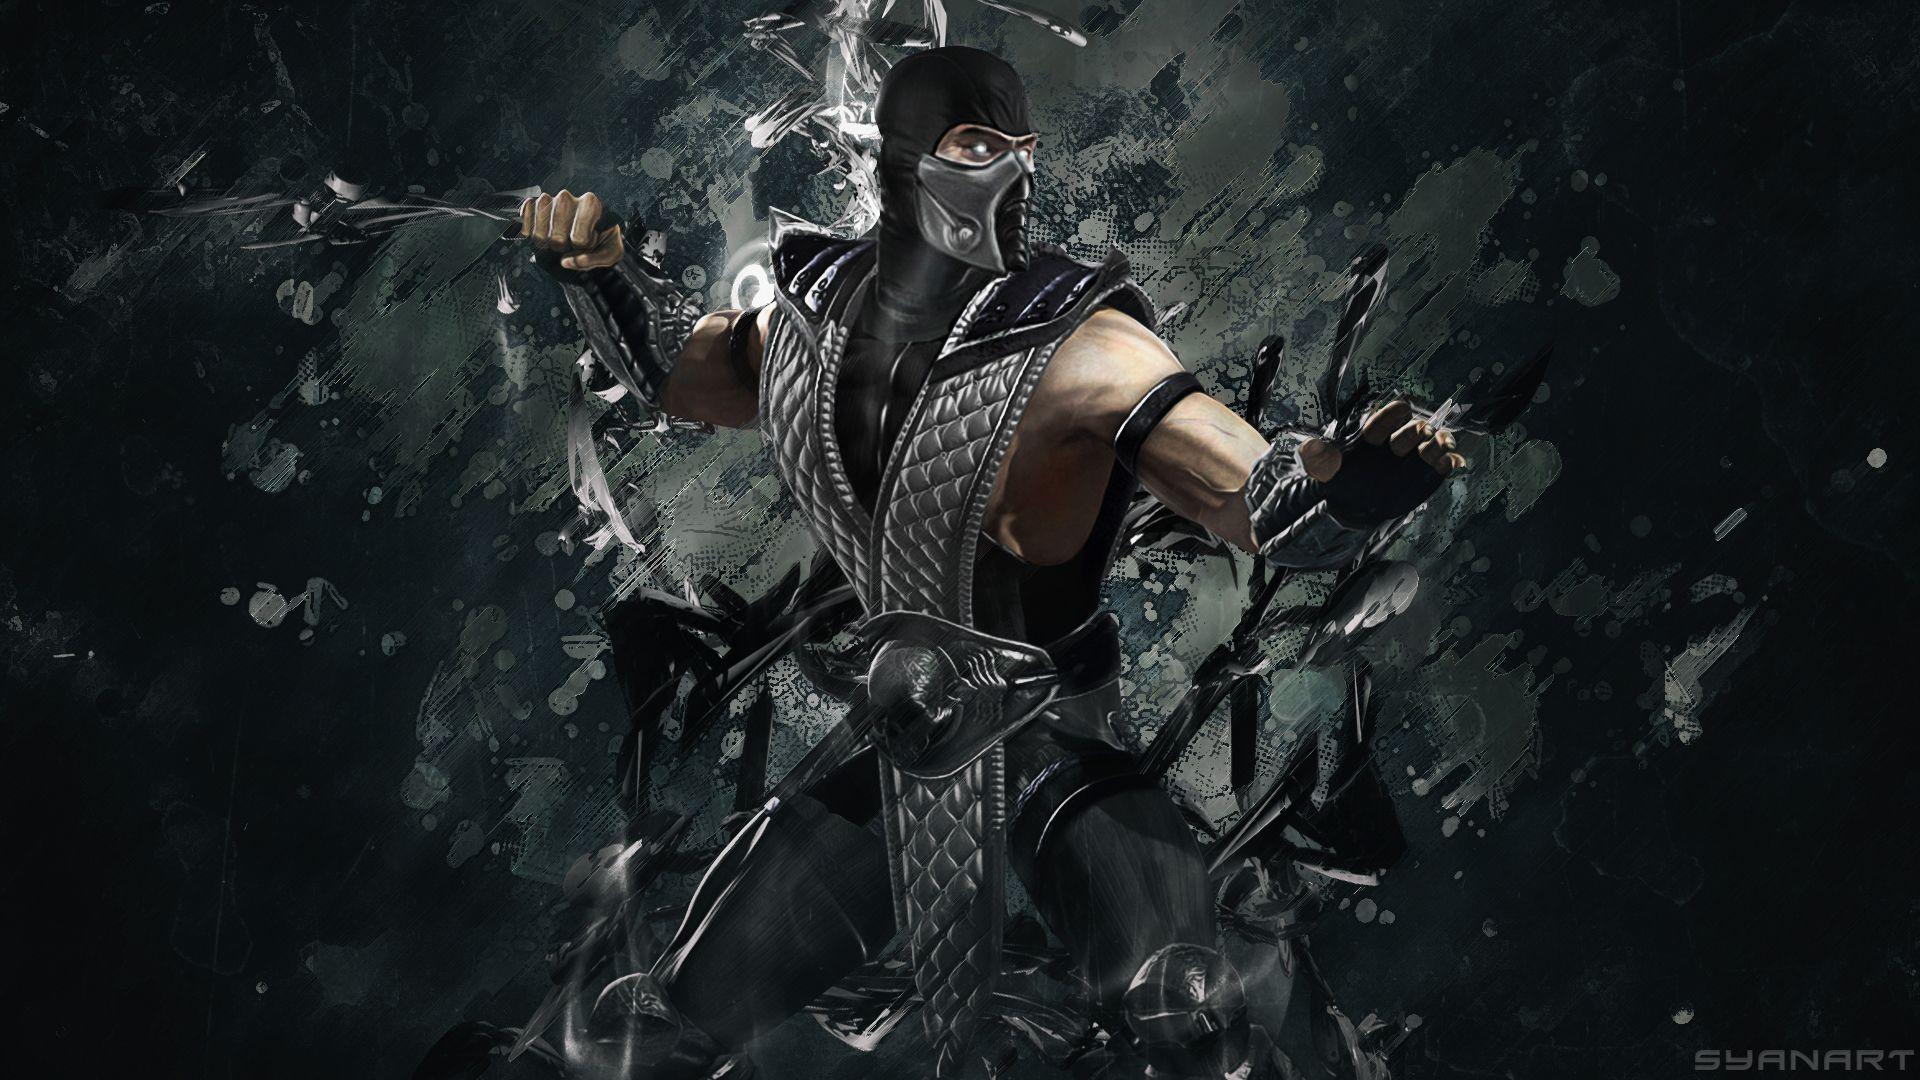 Smoke Mortal Kombat Wallpapers - Wallpaper Cave